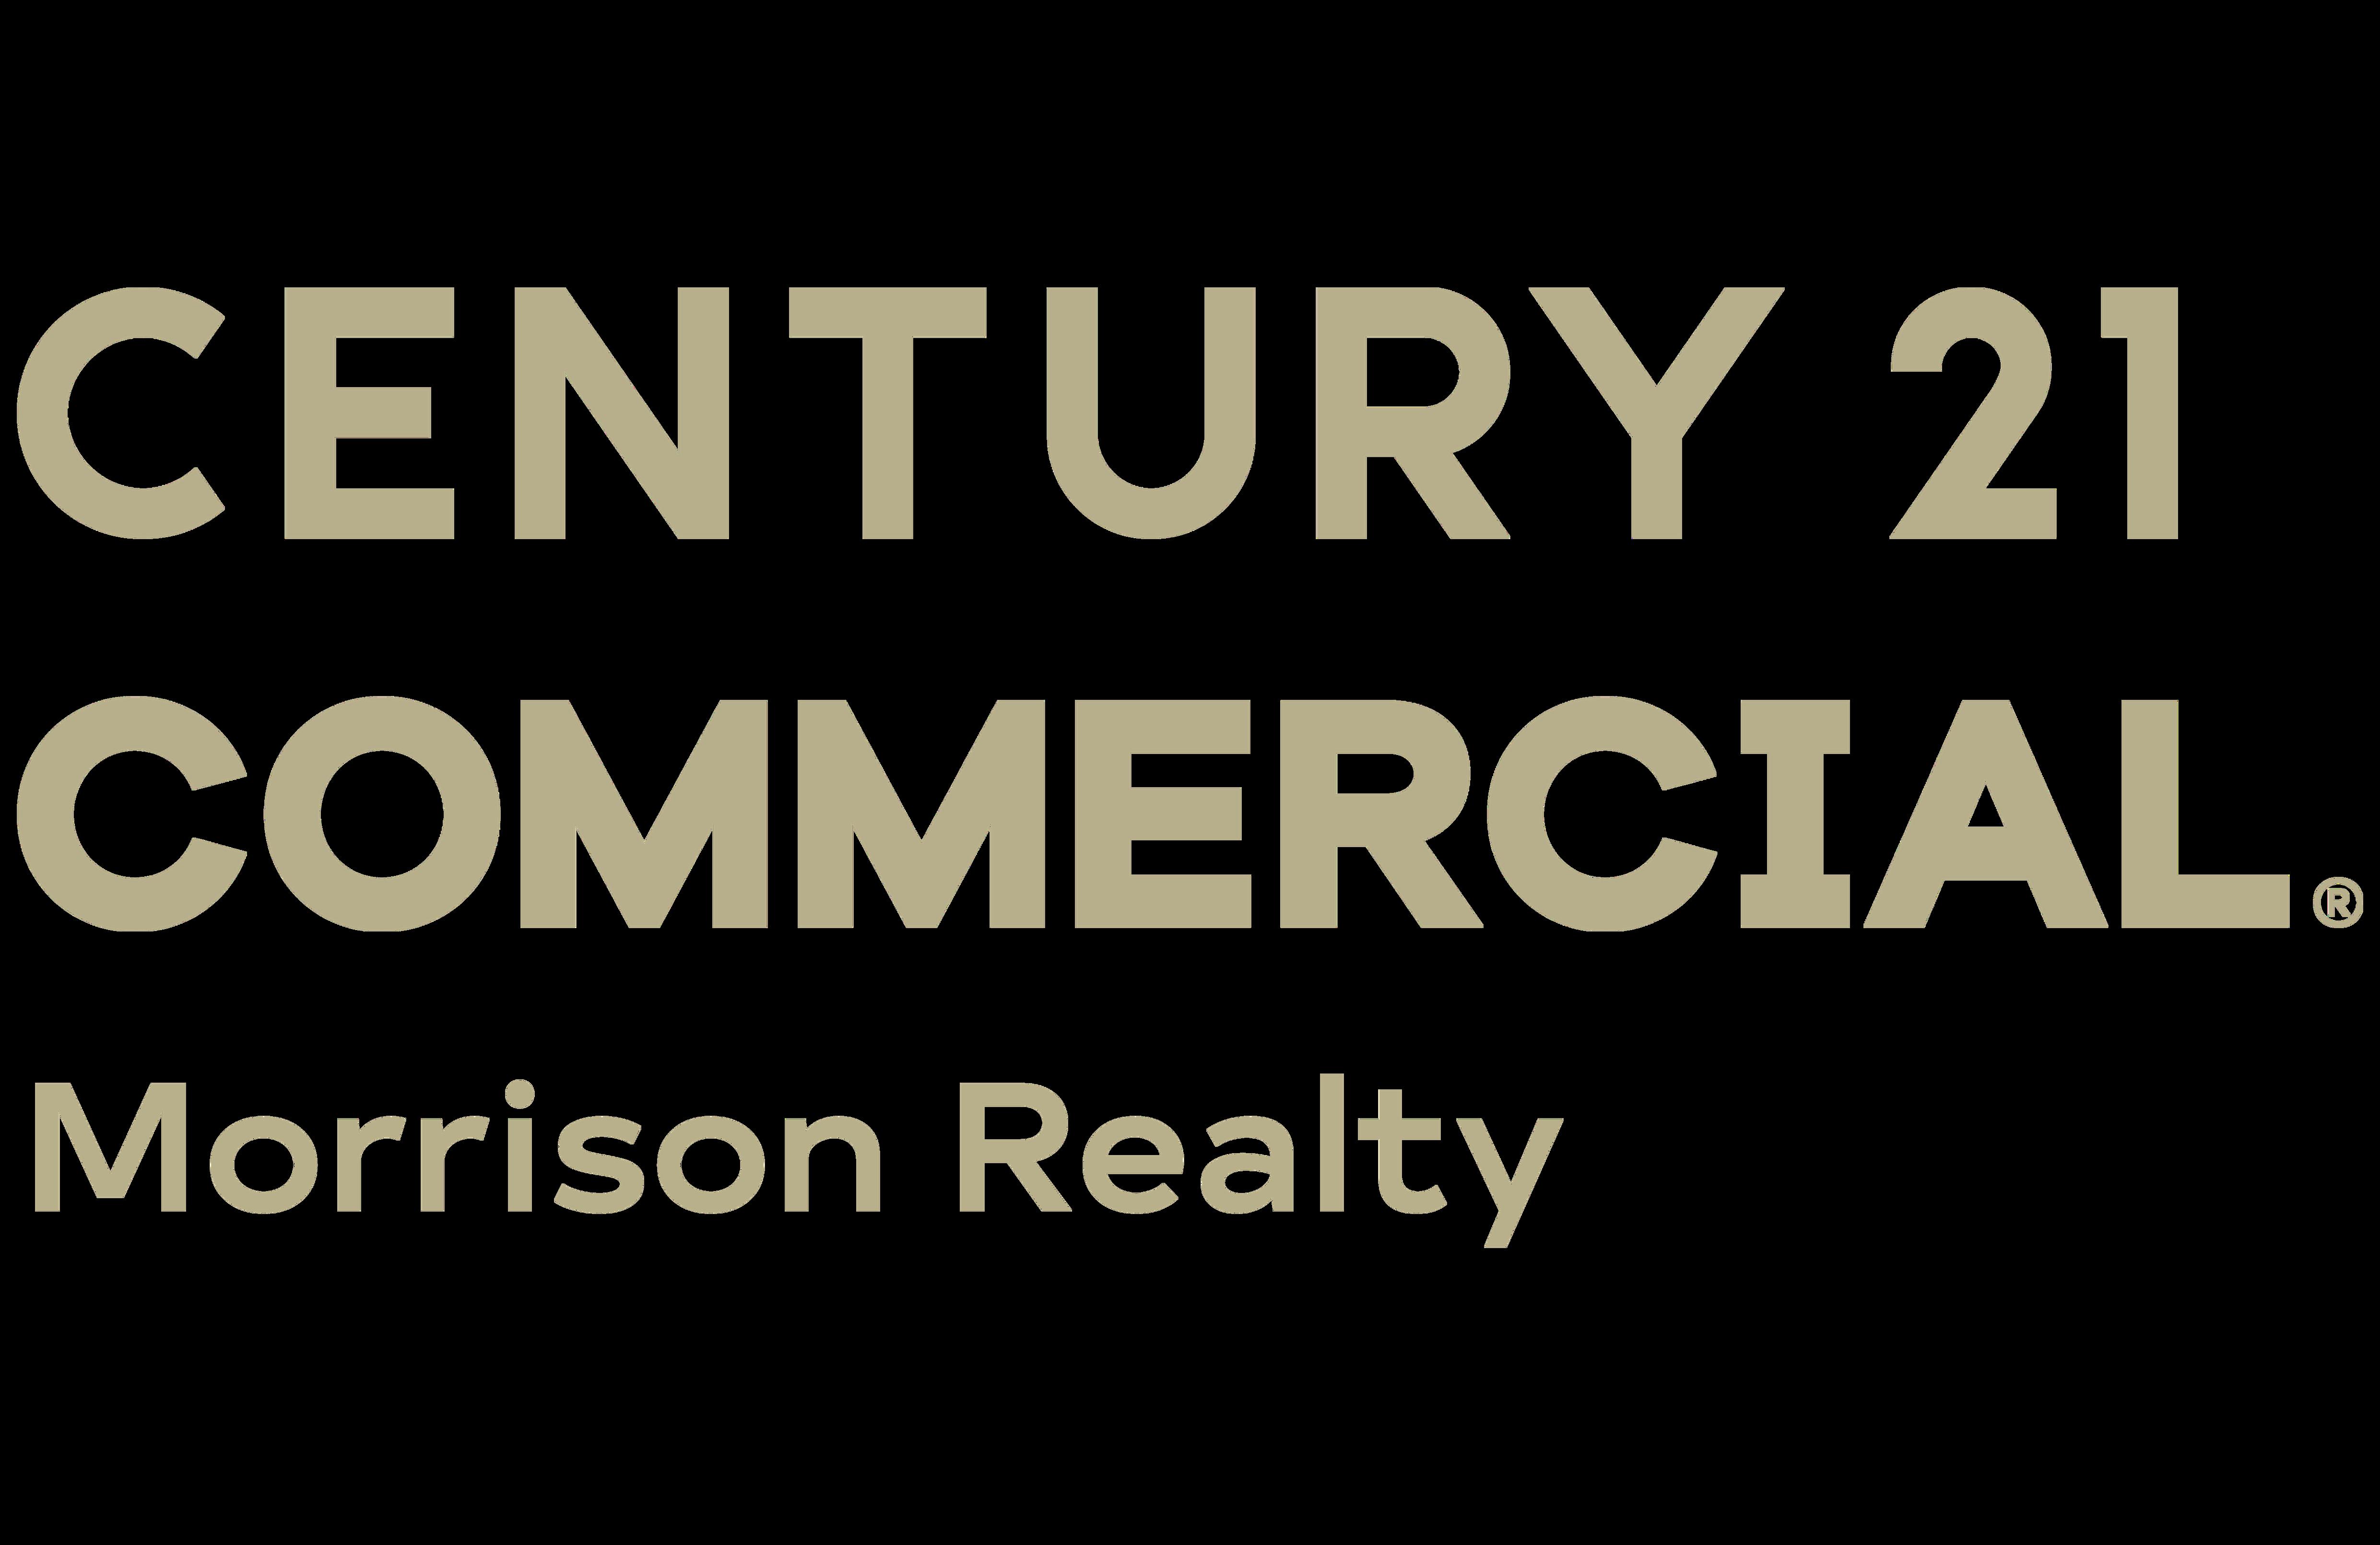 CENTURY 21 Morrison Realty